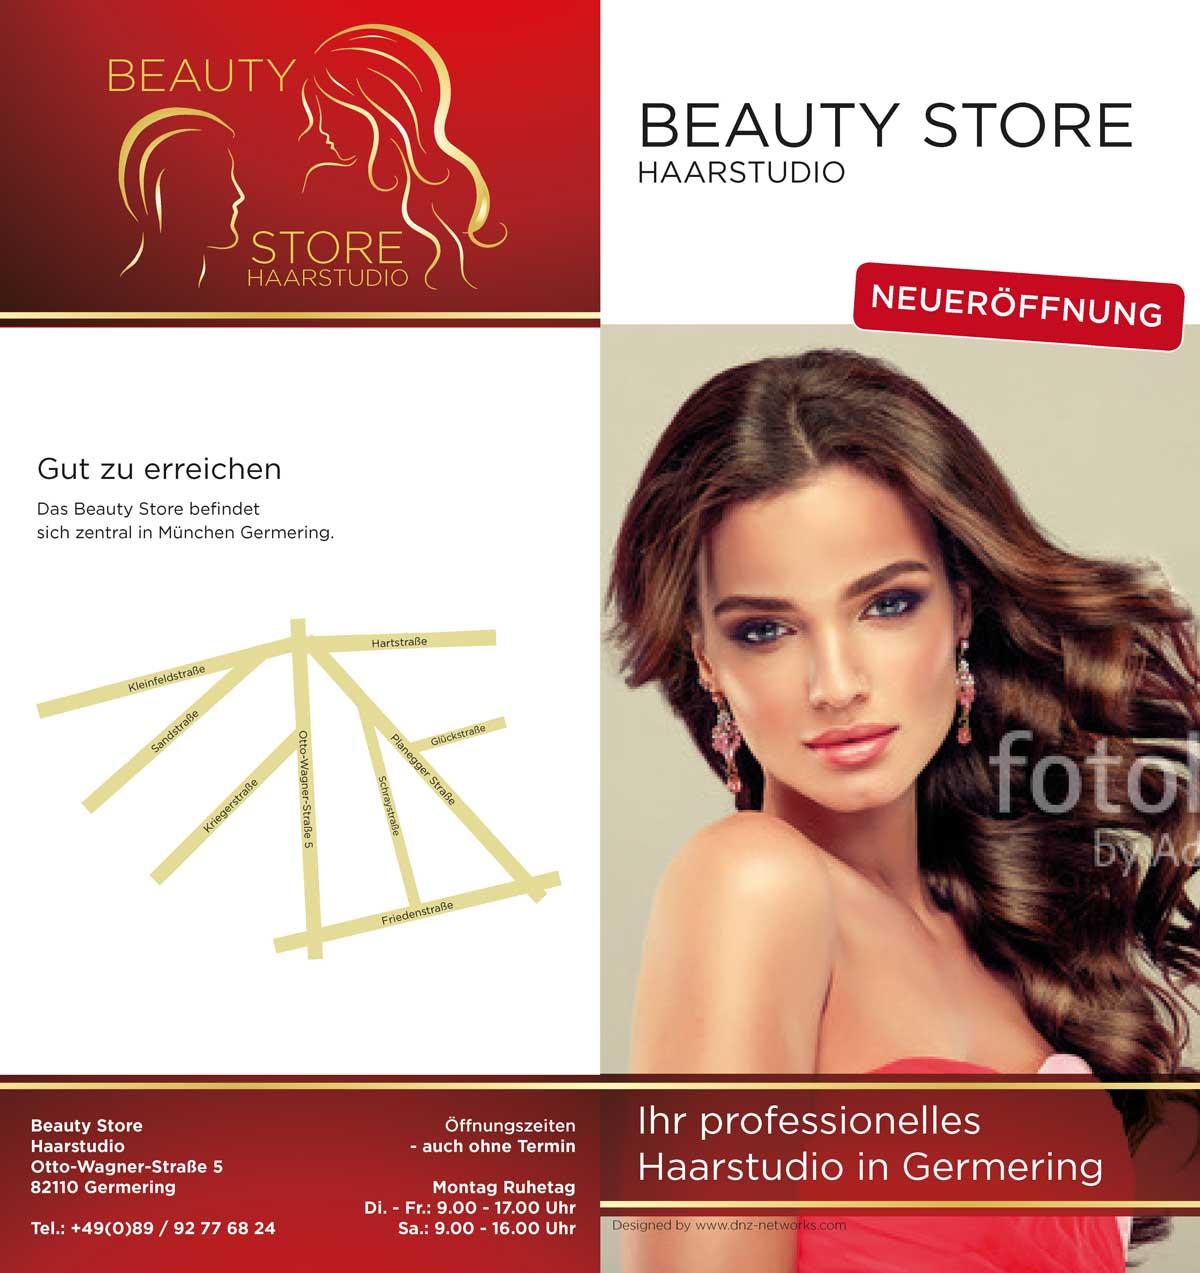 Flyer-Vorderseite-Beauty-Friseur-HaarstylistFlyer-Vorderseite-Beauty-Friseur-Haarstylist